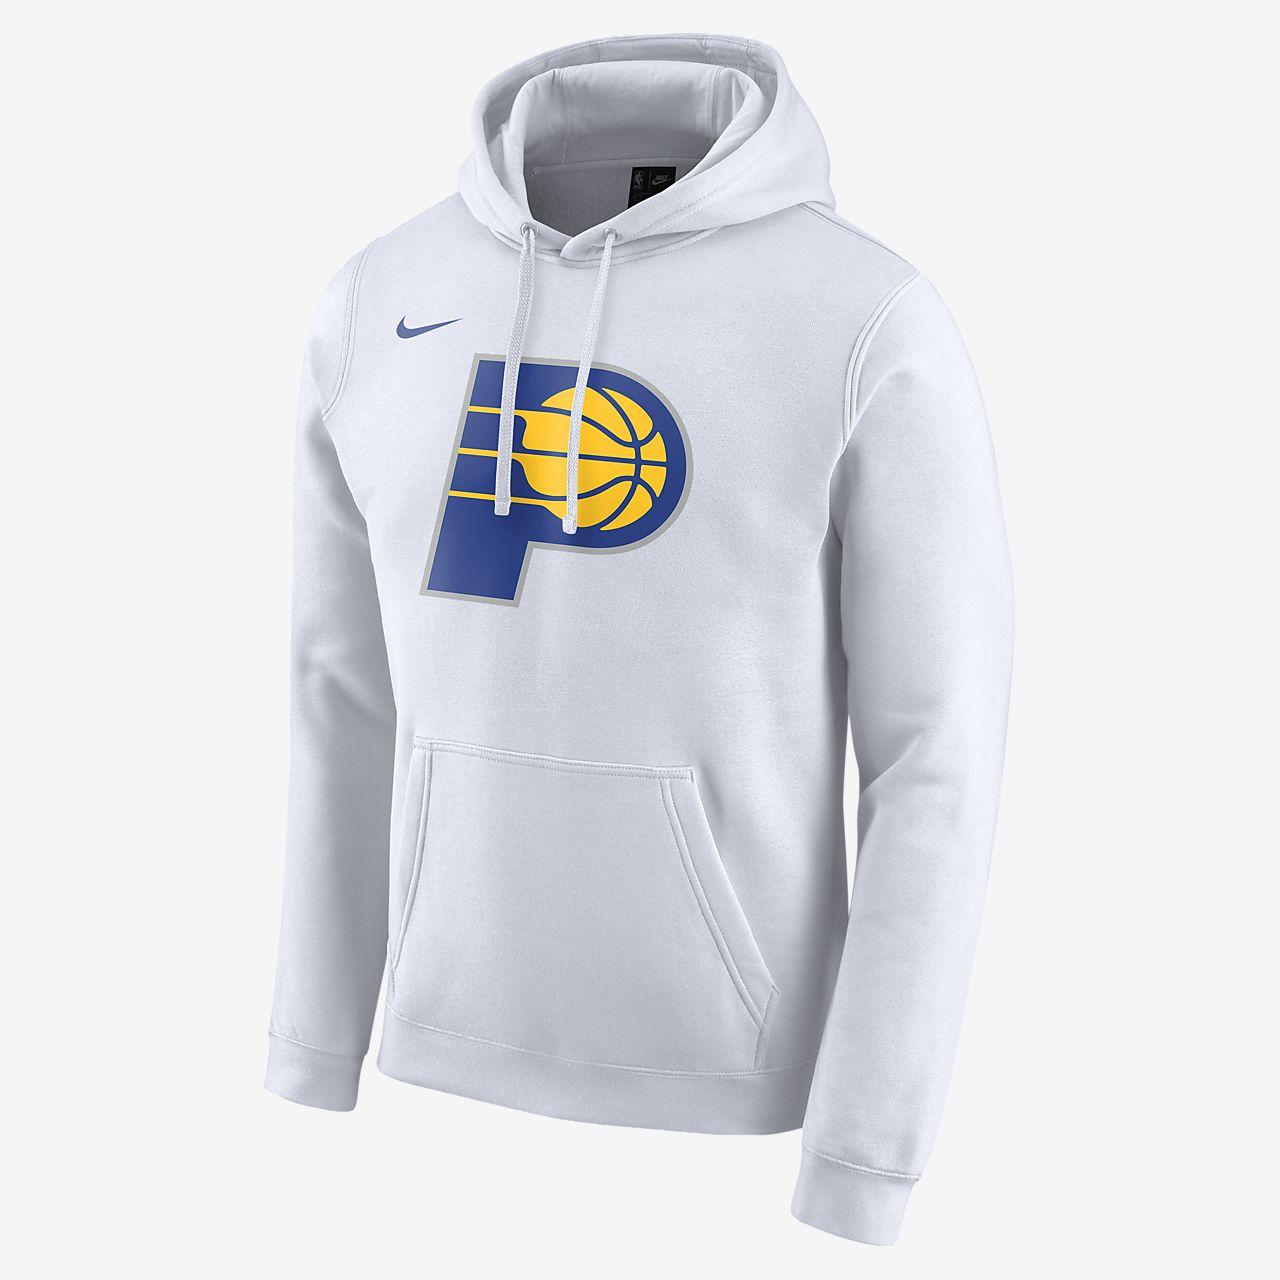 Męska bluza z kapturem NBA Nike Pacers City Edition Logo